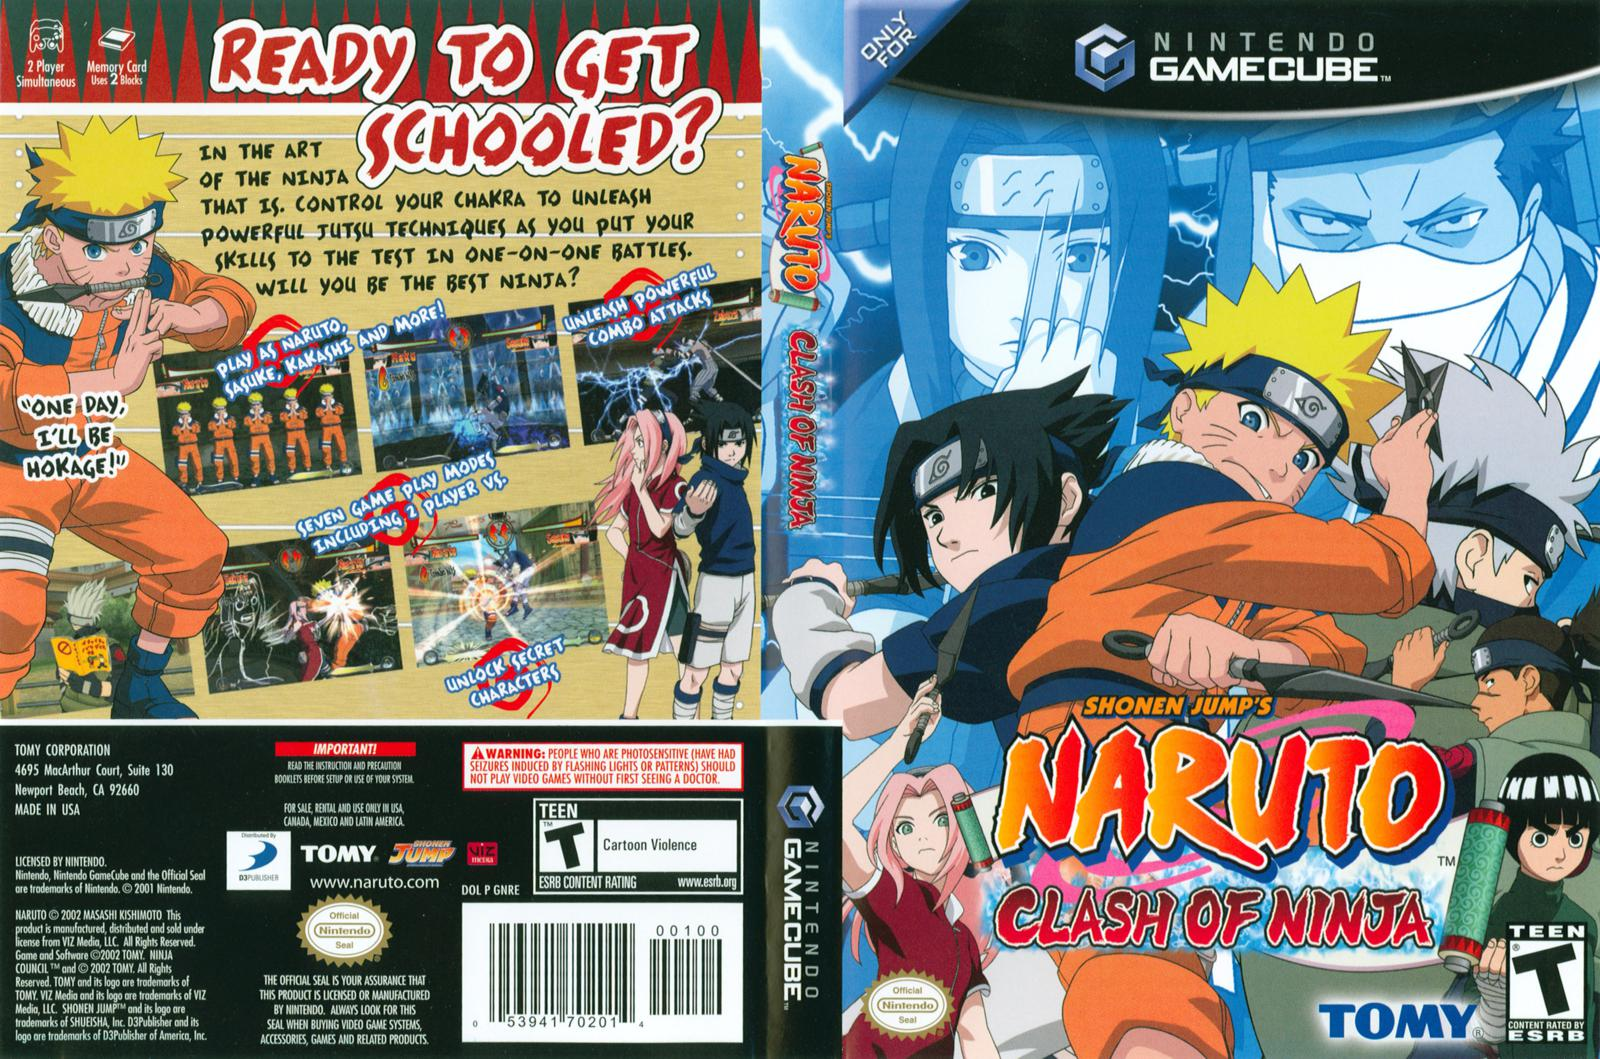 Naruto clash of ninja revolution 3 rom Download